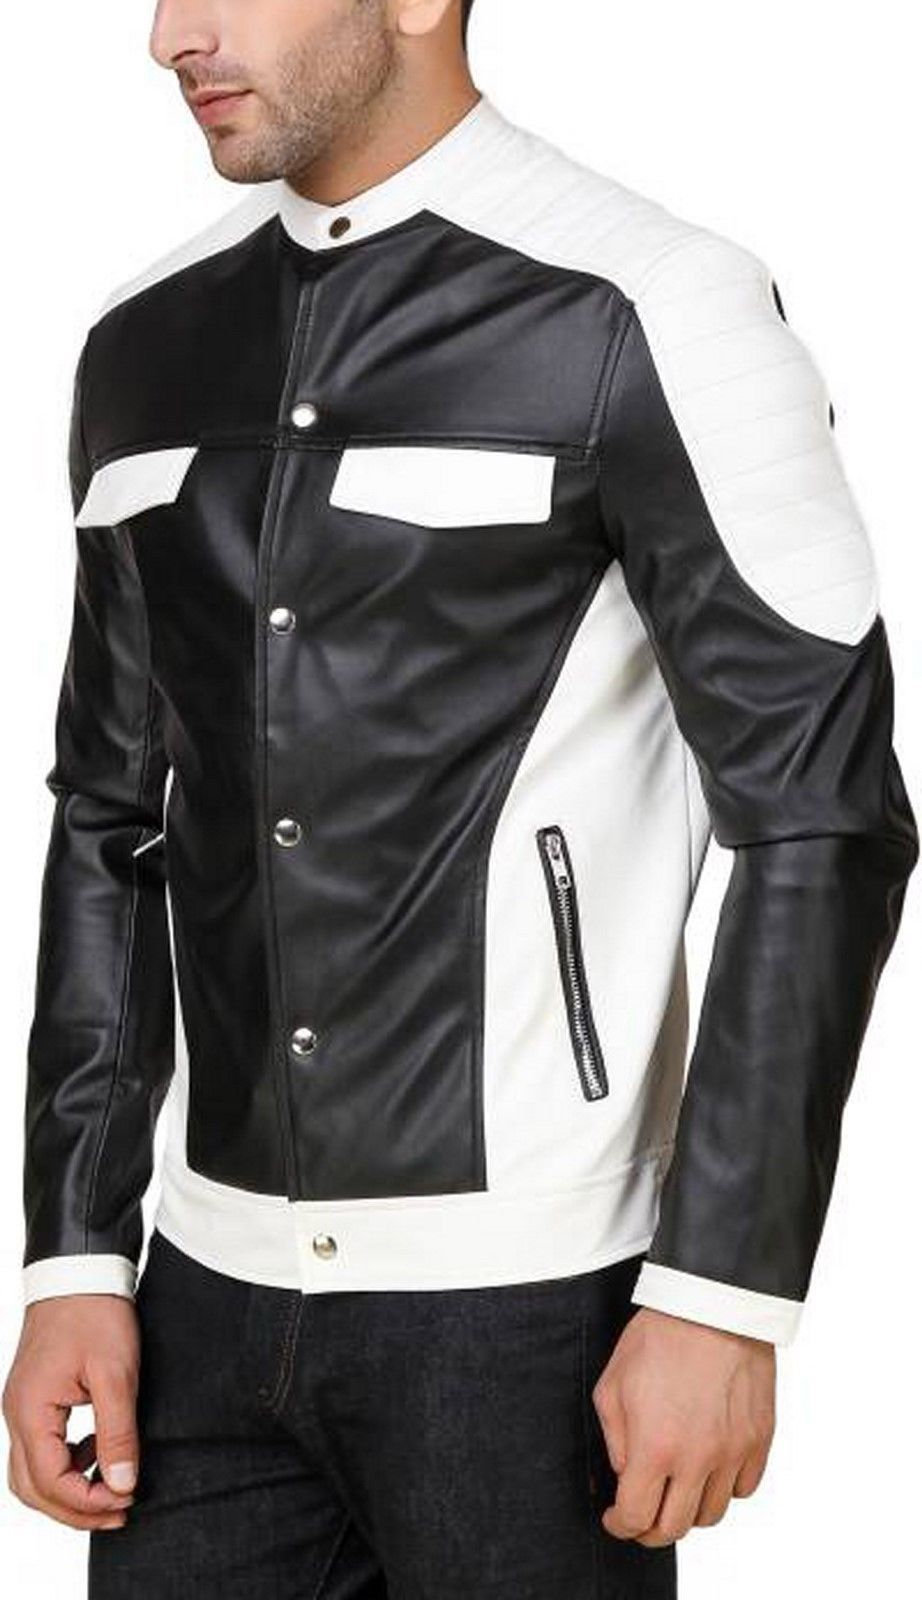 d048d3b74ea Handmade Men Genuine Lambskin Leather Jacket,Black White Biker Motorcycle  jacket